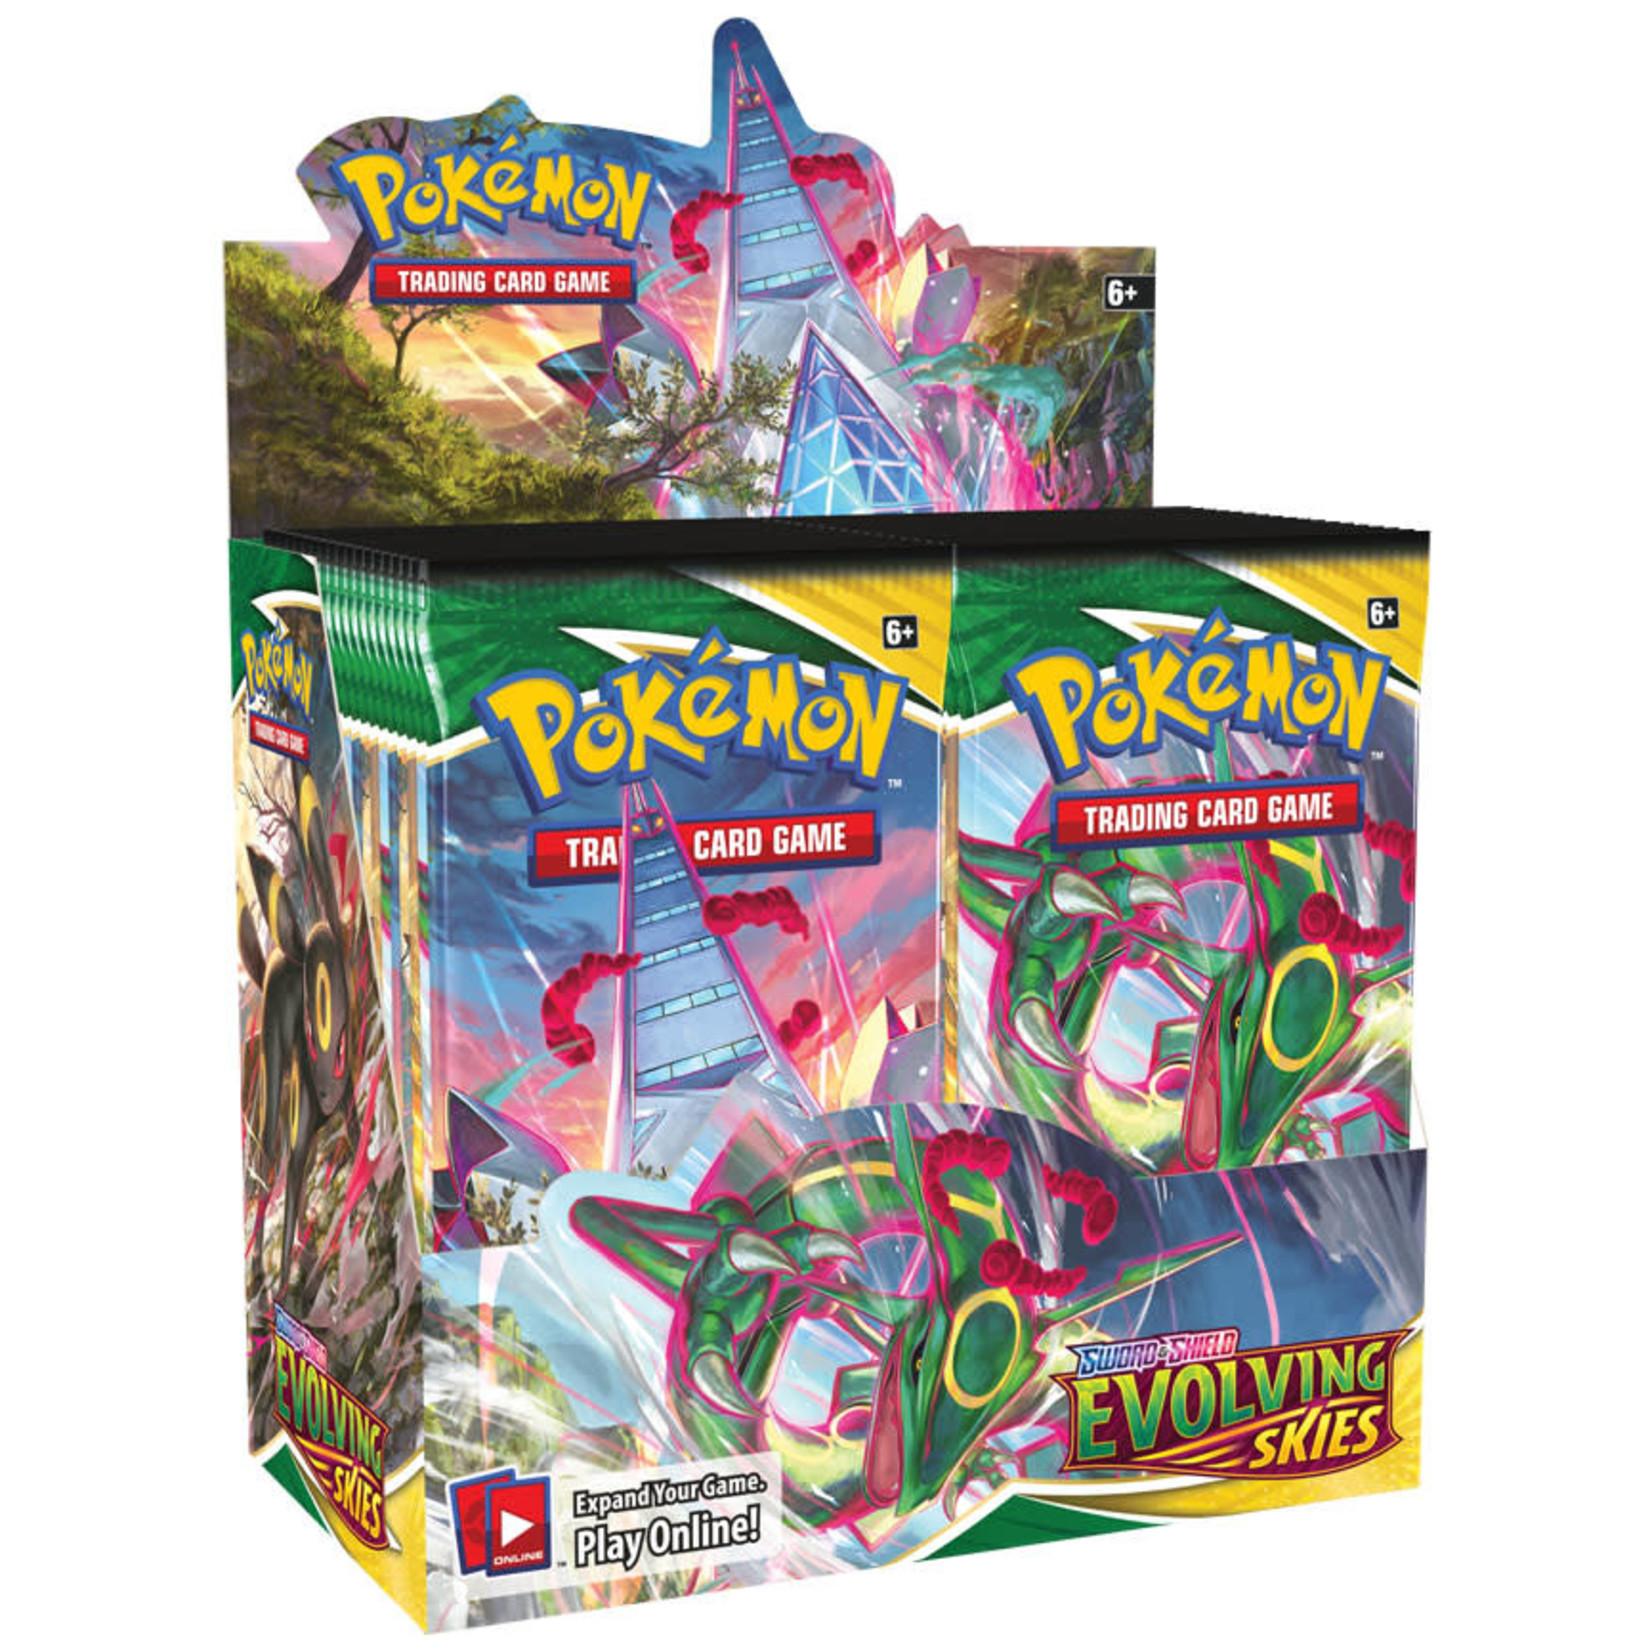 Pokémon Pokémon TCG: Sword & Shield—Evolving Skies Booster Box